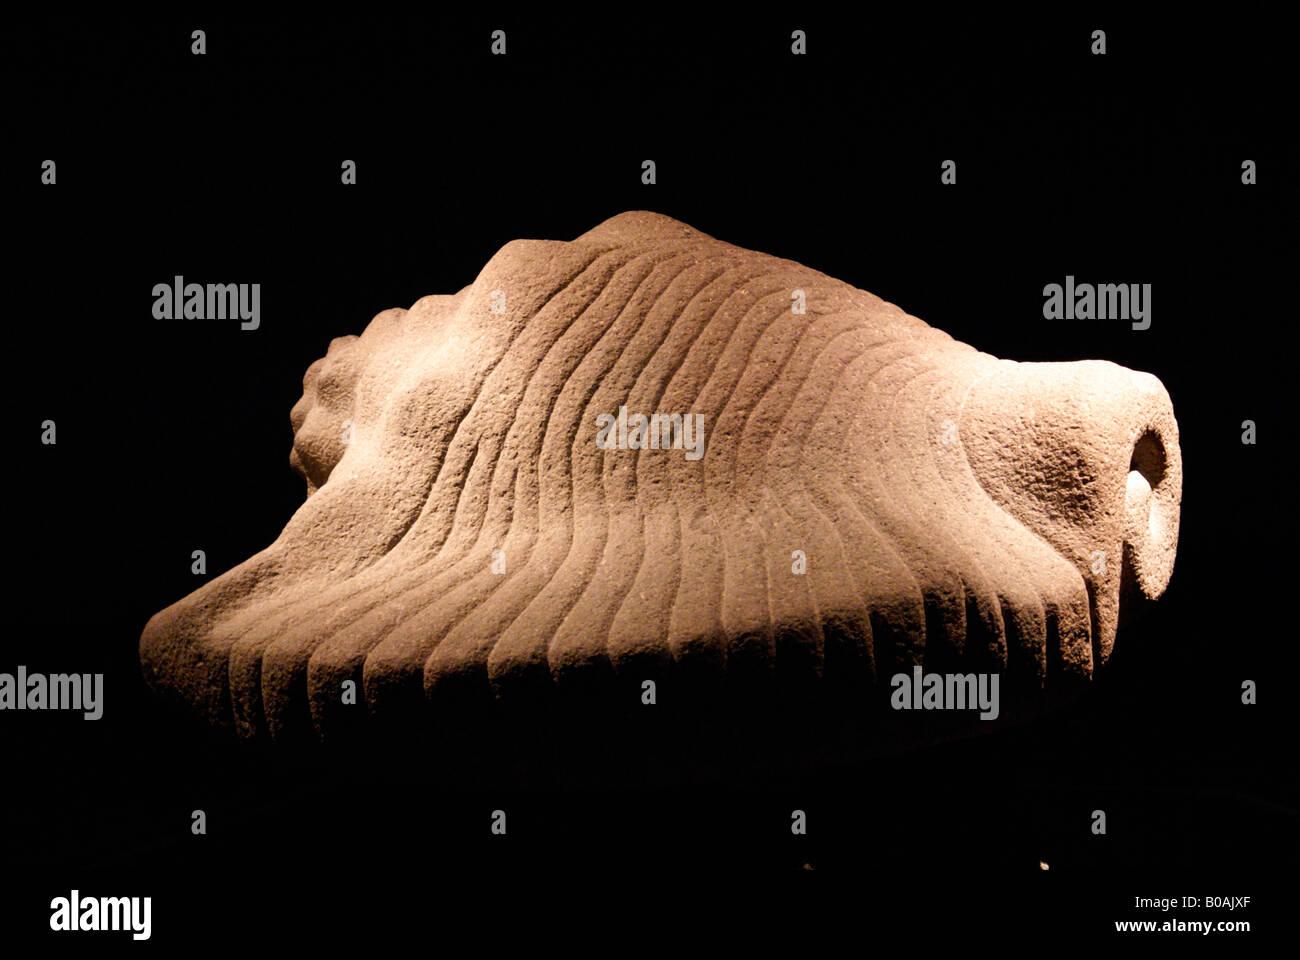 Aztec conch shell sculpture, Museo del Templo Mayor, Mexico City Stock Photo